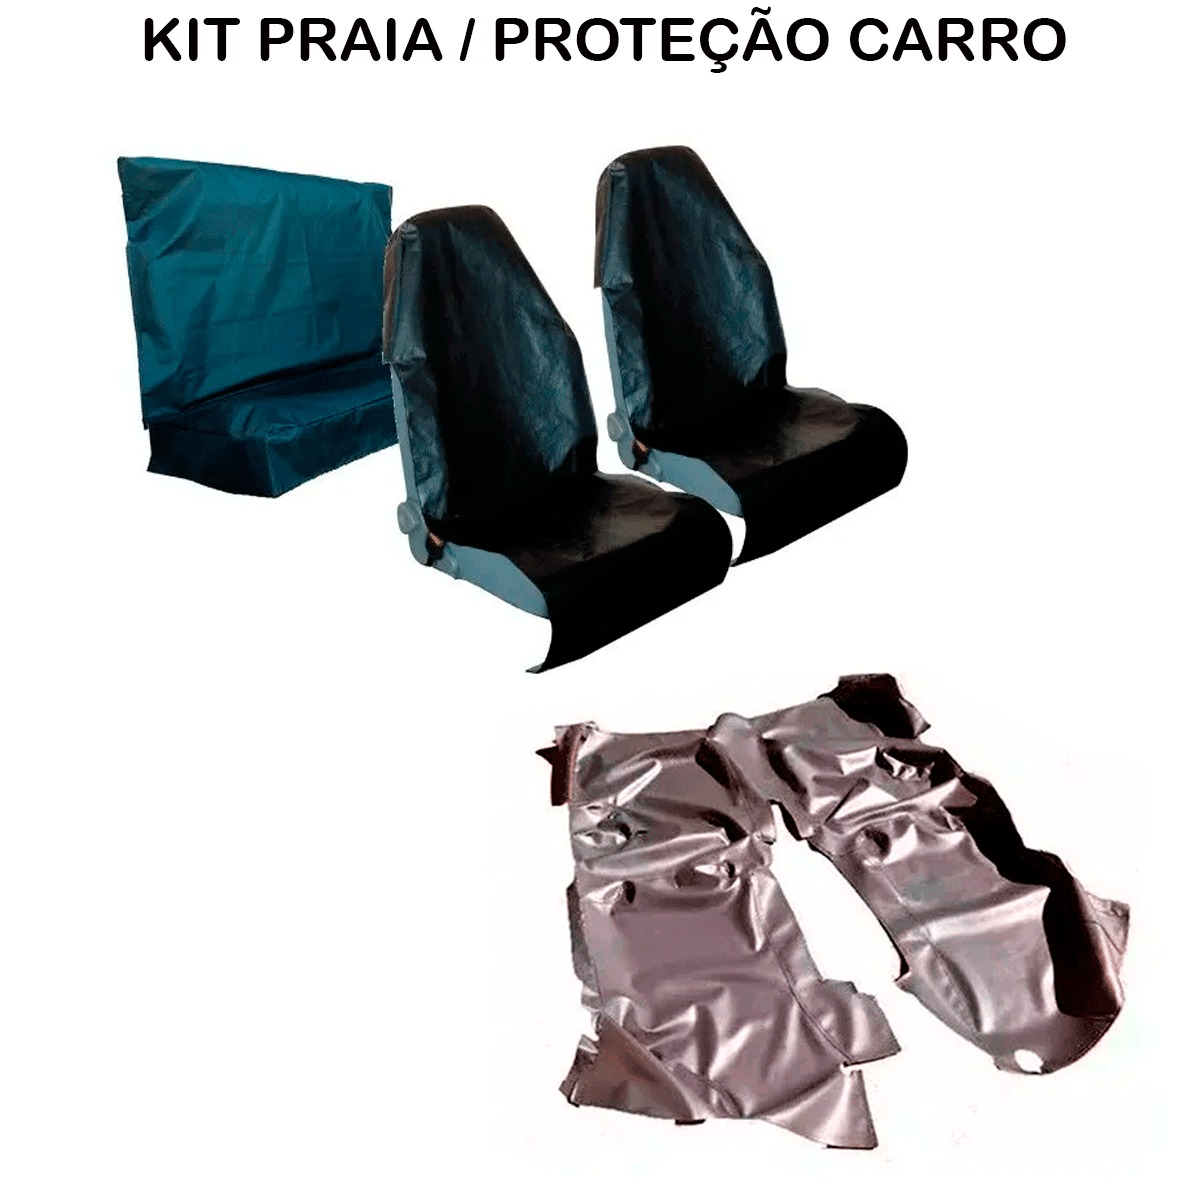 Tapete Em Vinil Volkswagen Polo 2002 a 2015 + Capa Banco Protecao Banco Areia Suor Academia